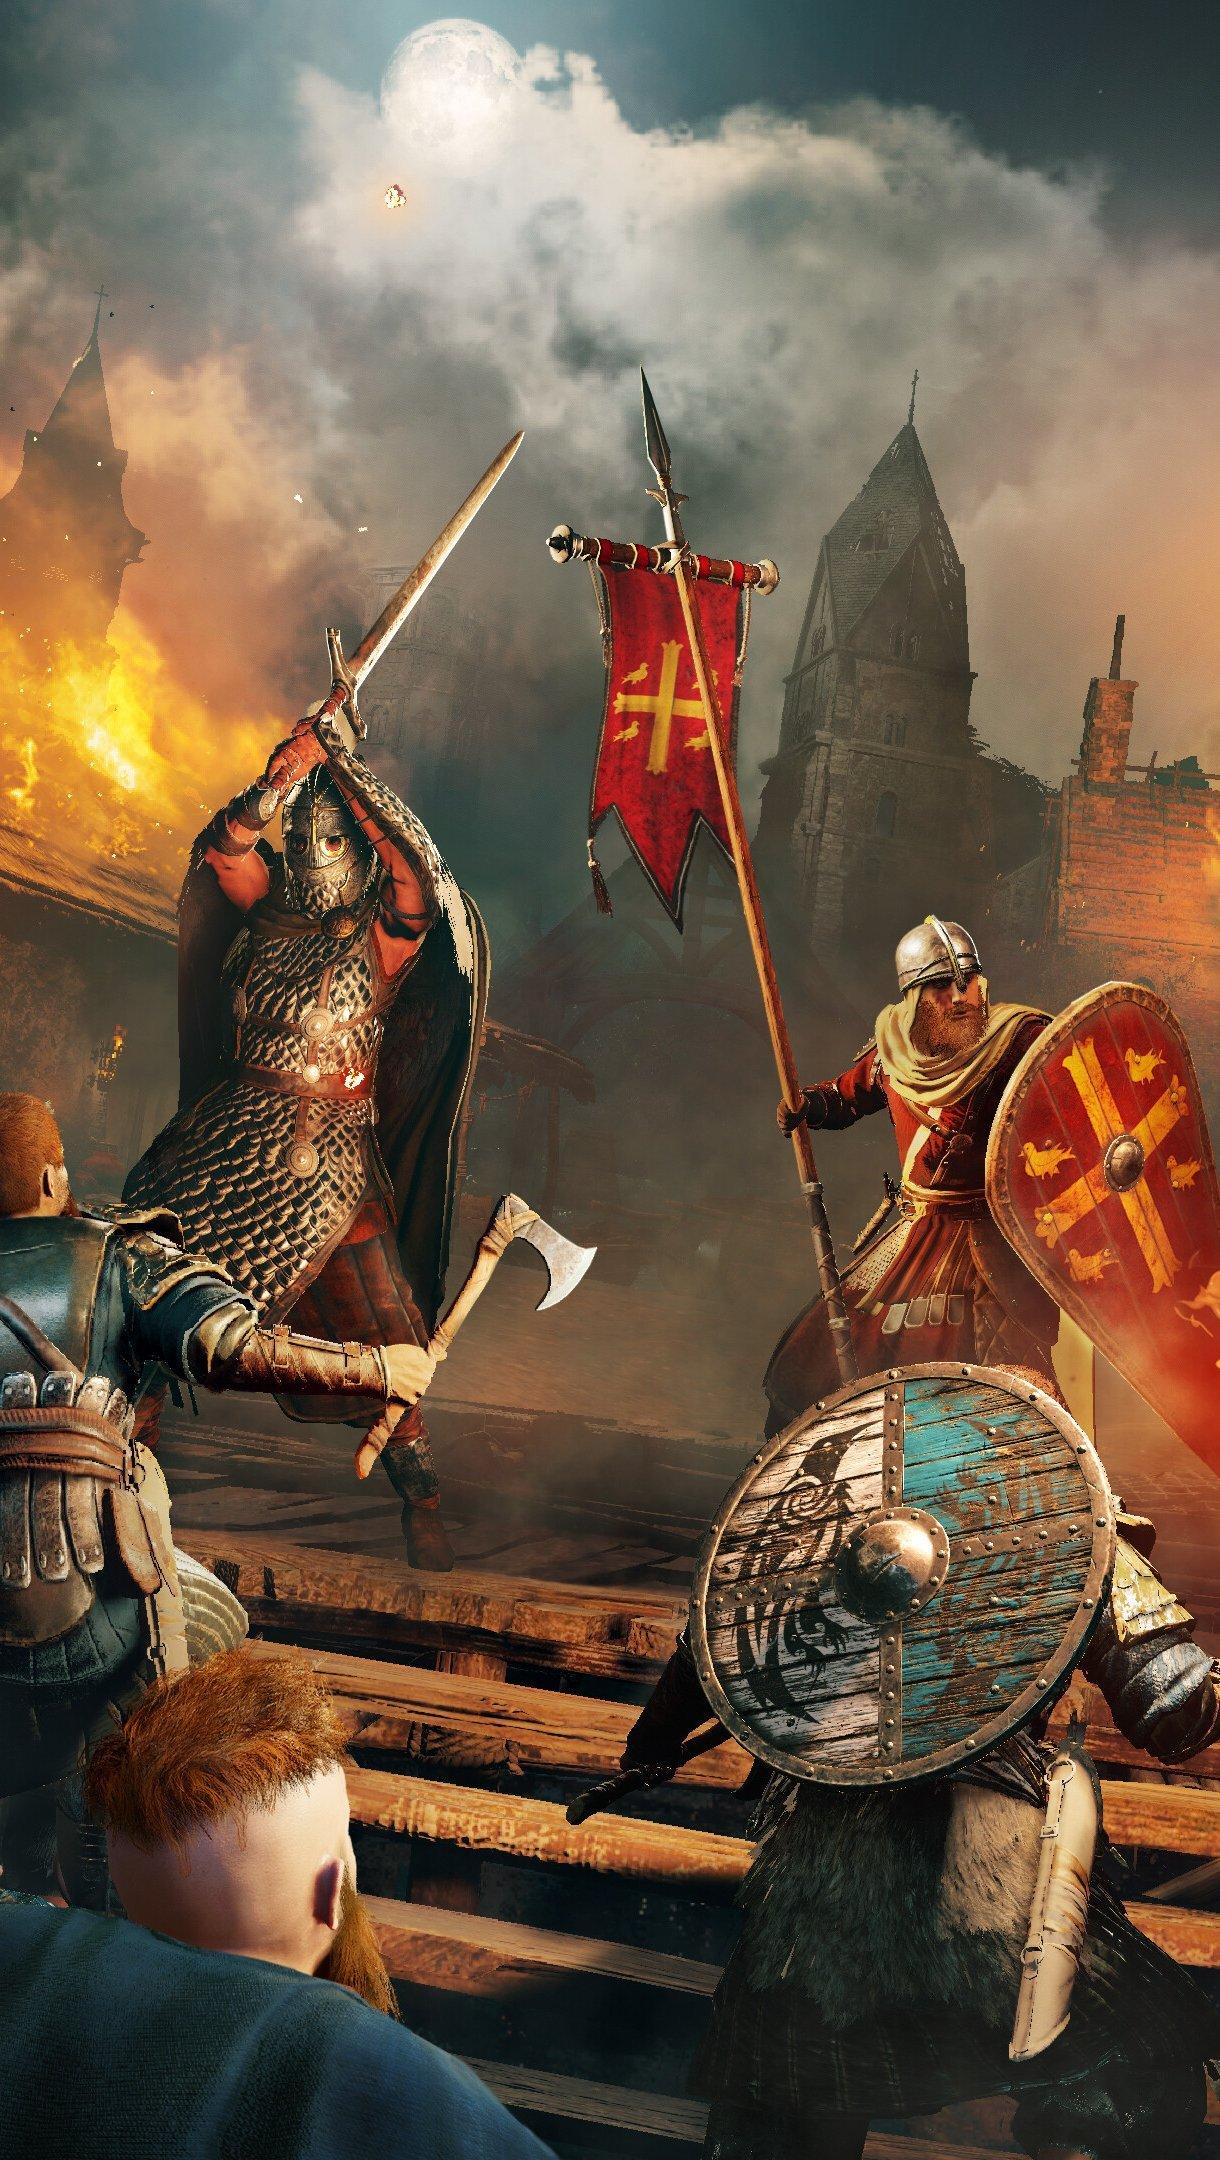 Fondos de pantalla Assassins Creed Valhalla Personaje Eivor Vertical